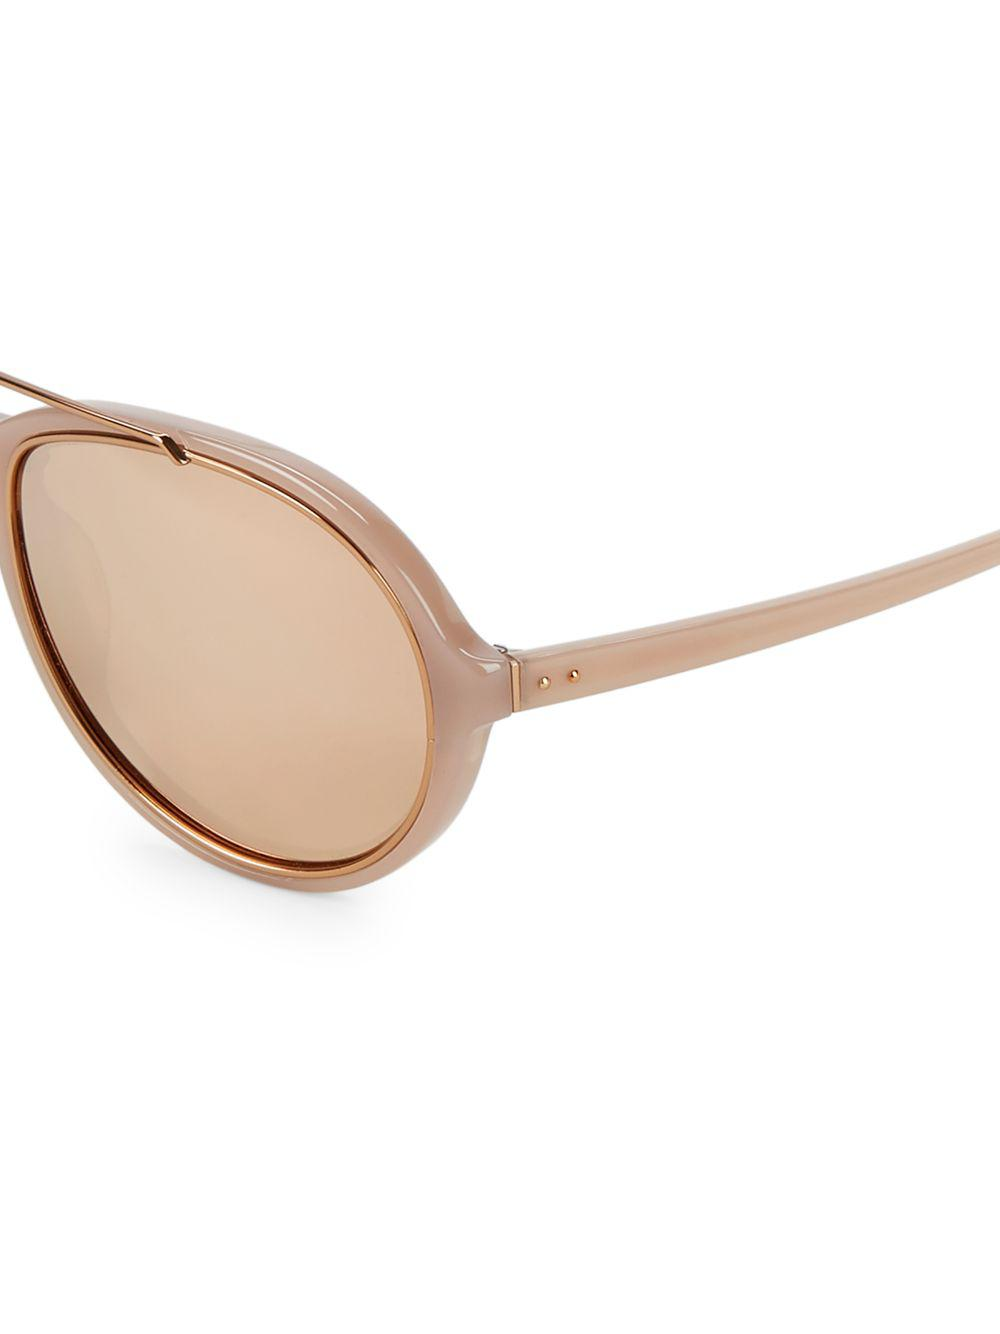 17bee03e0cc Linda Farrow 59mm Oval Sunglasses - Lyst